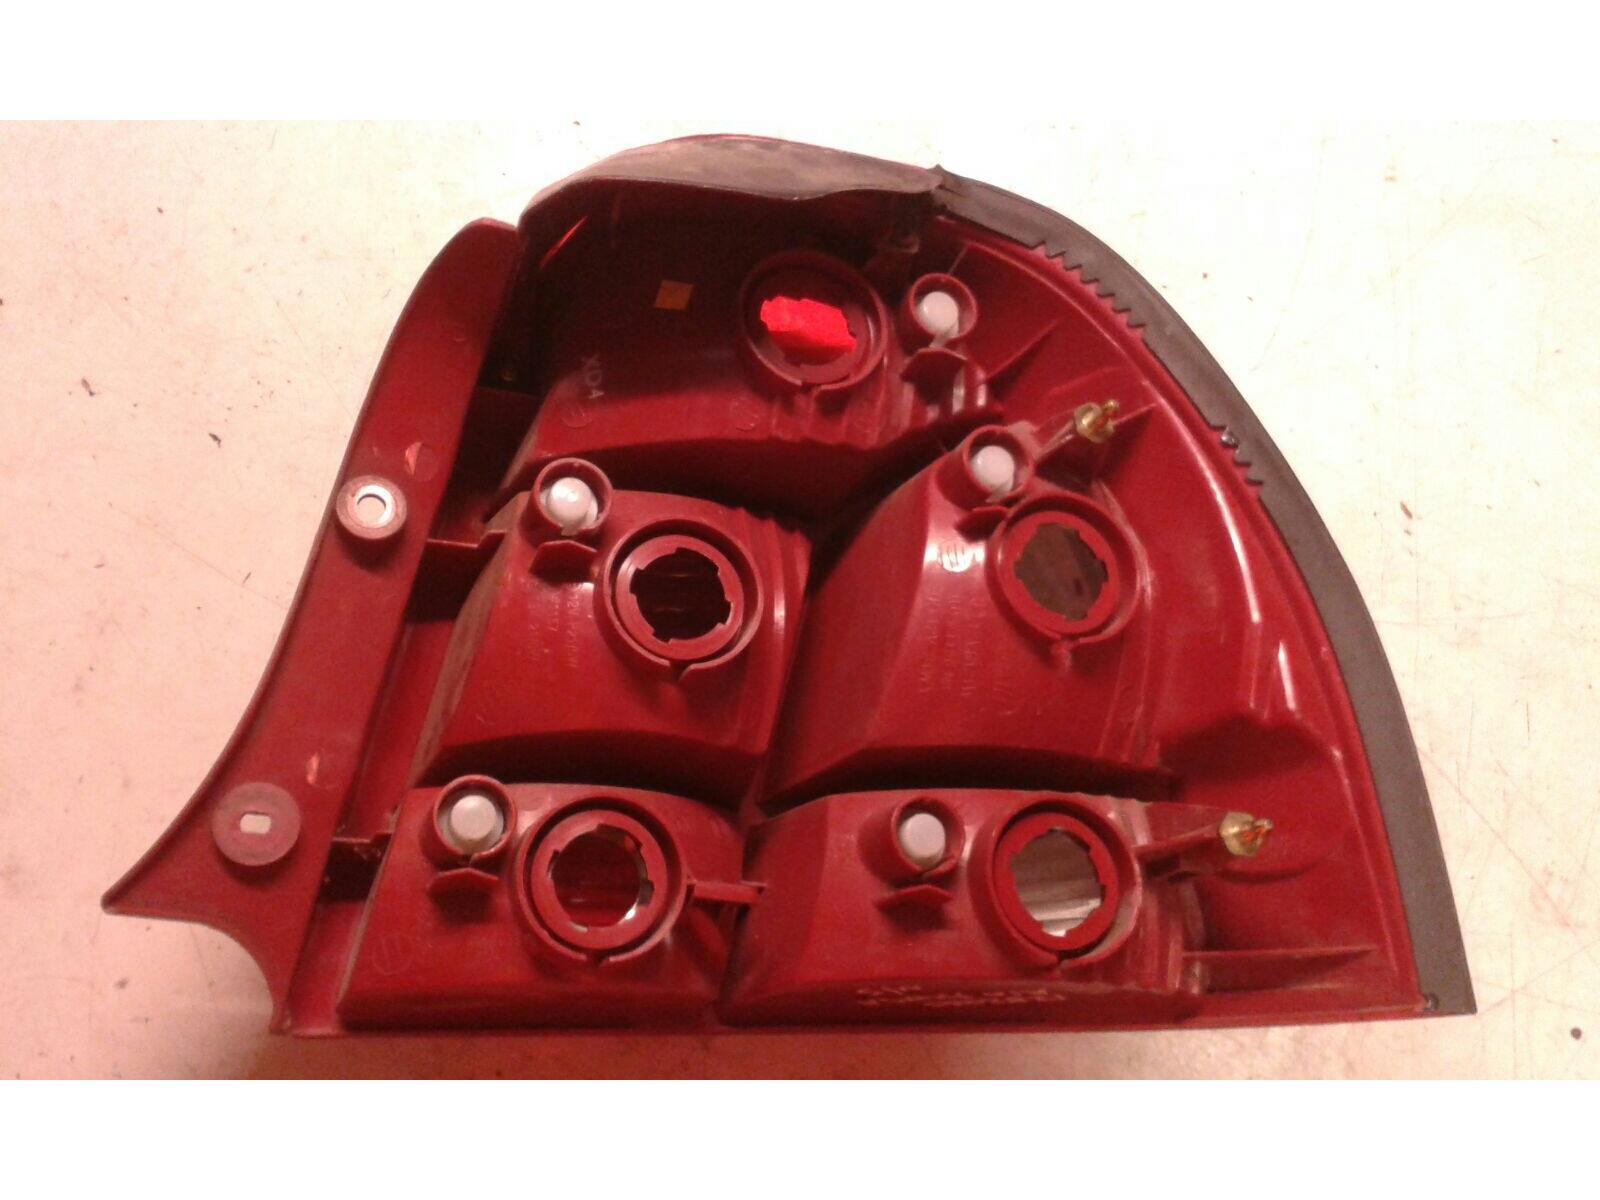 Kia Shuma Ii 2002 To 2004 Lamp Assembly Rear Lh Petrol Manual 2 Fuse Box Ns Tail Light Lx 5 Door Hatchback 1318841